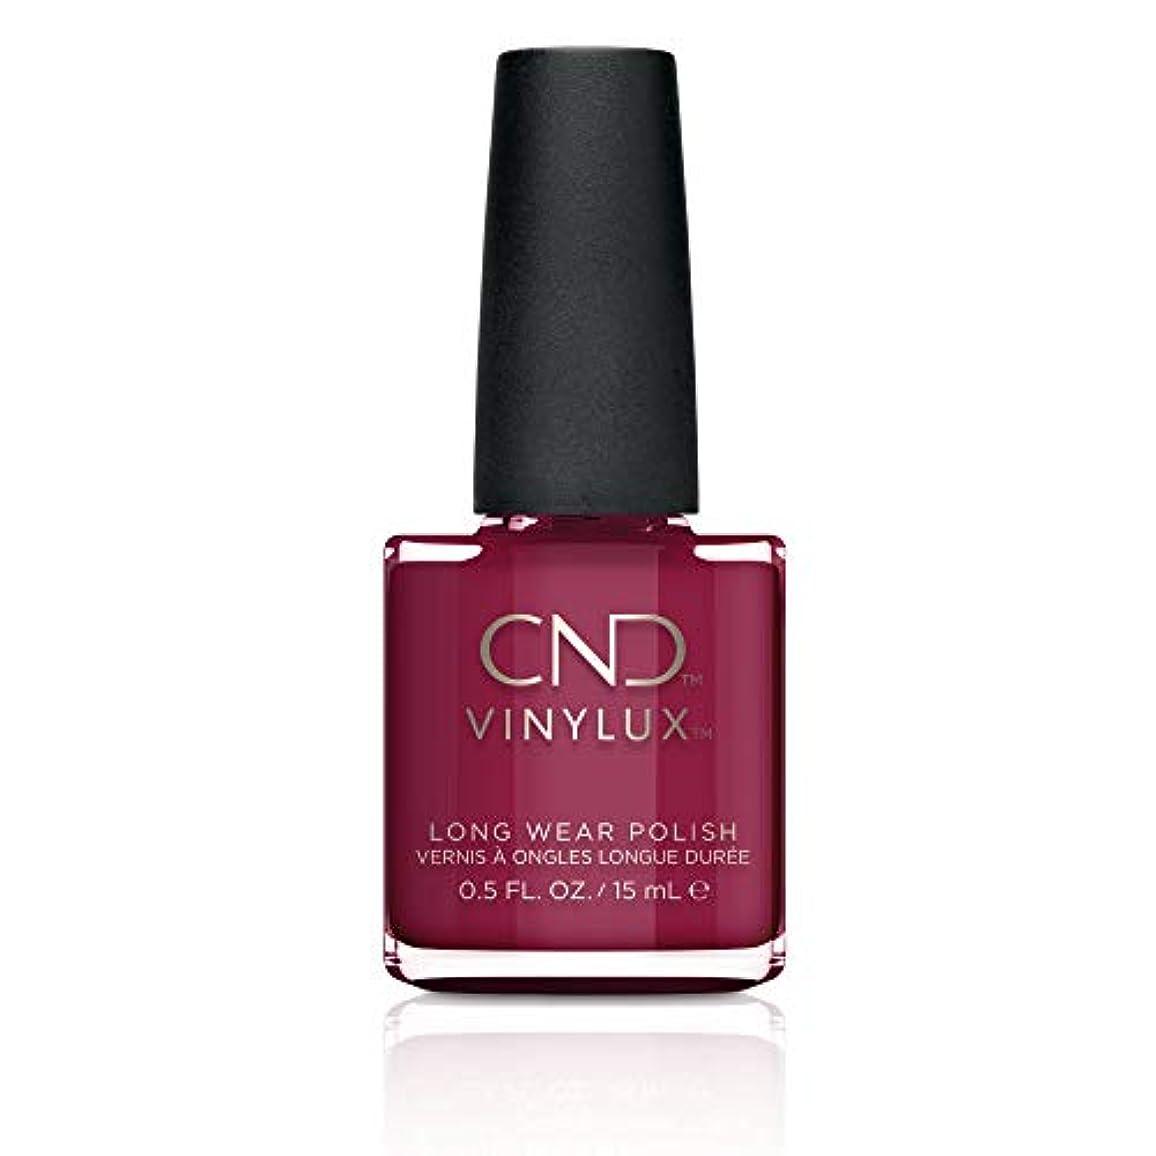 CND Vinylux Nail Polish - Rouge Rite - 0.5oz / 15ml